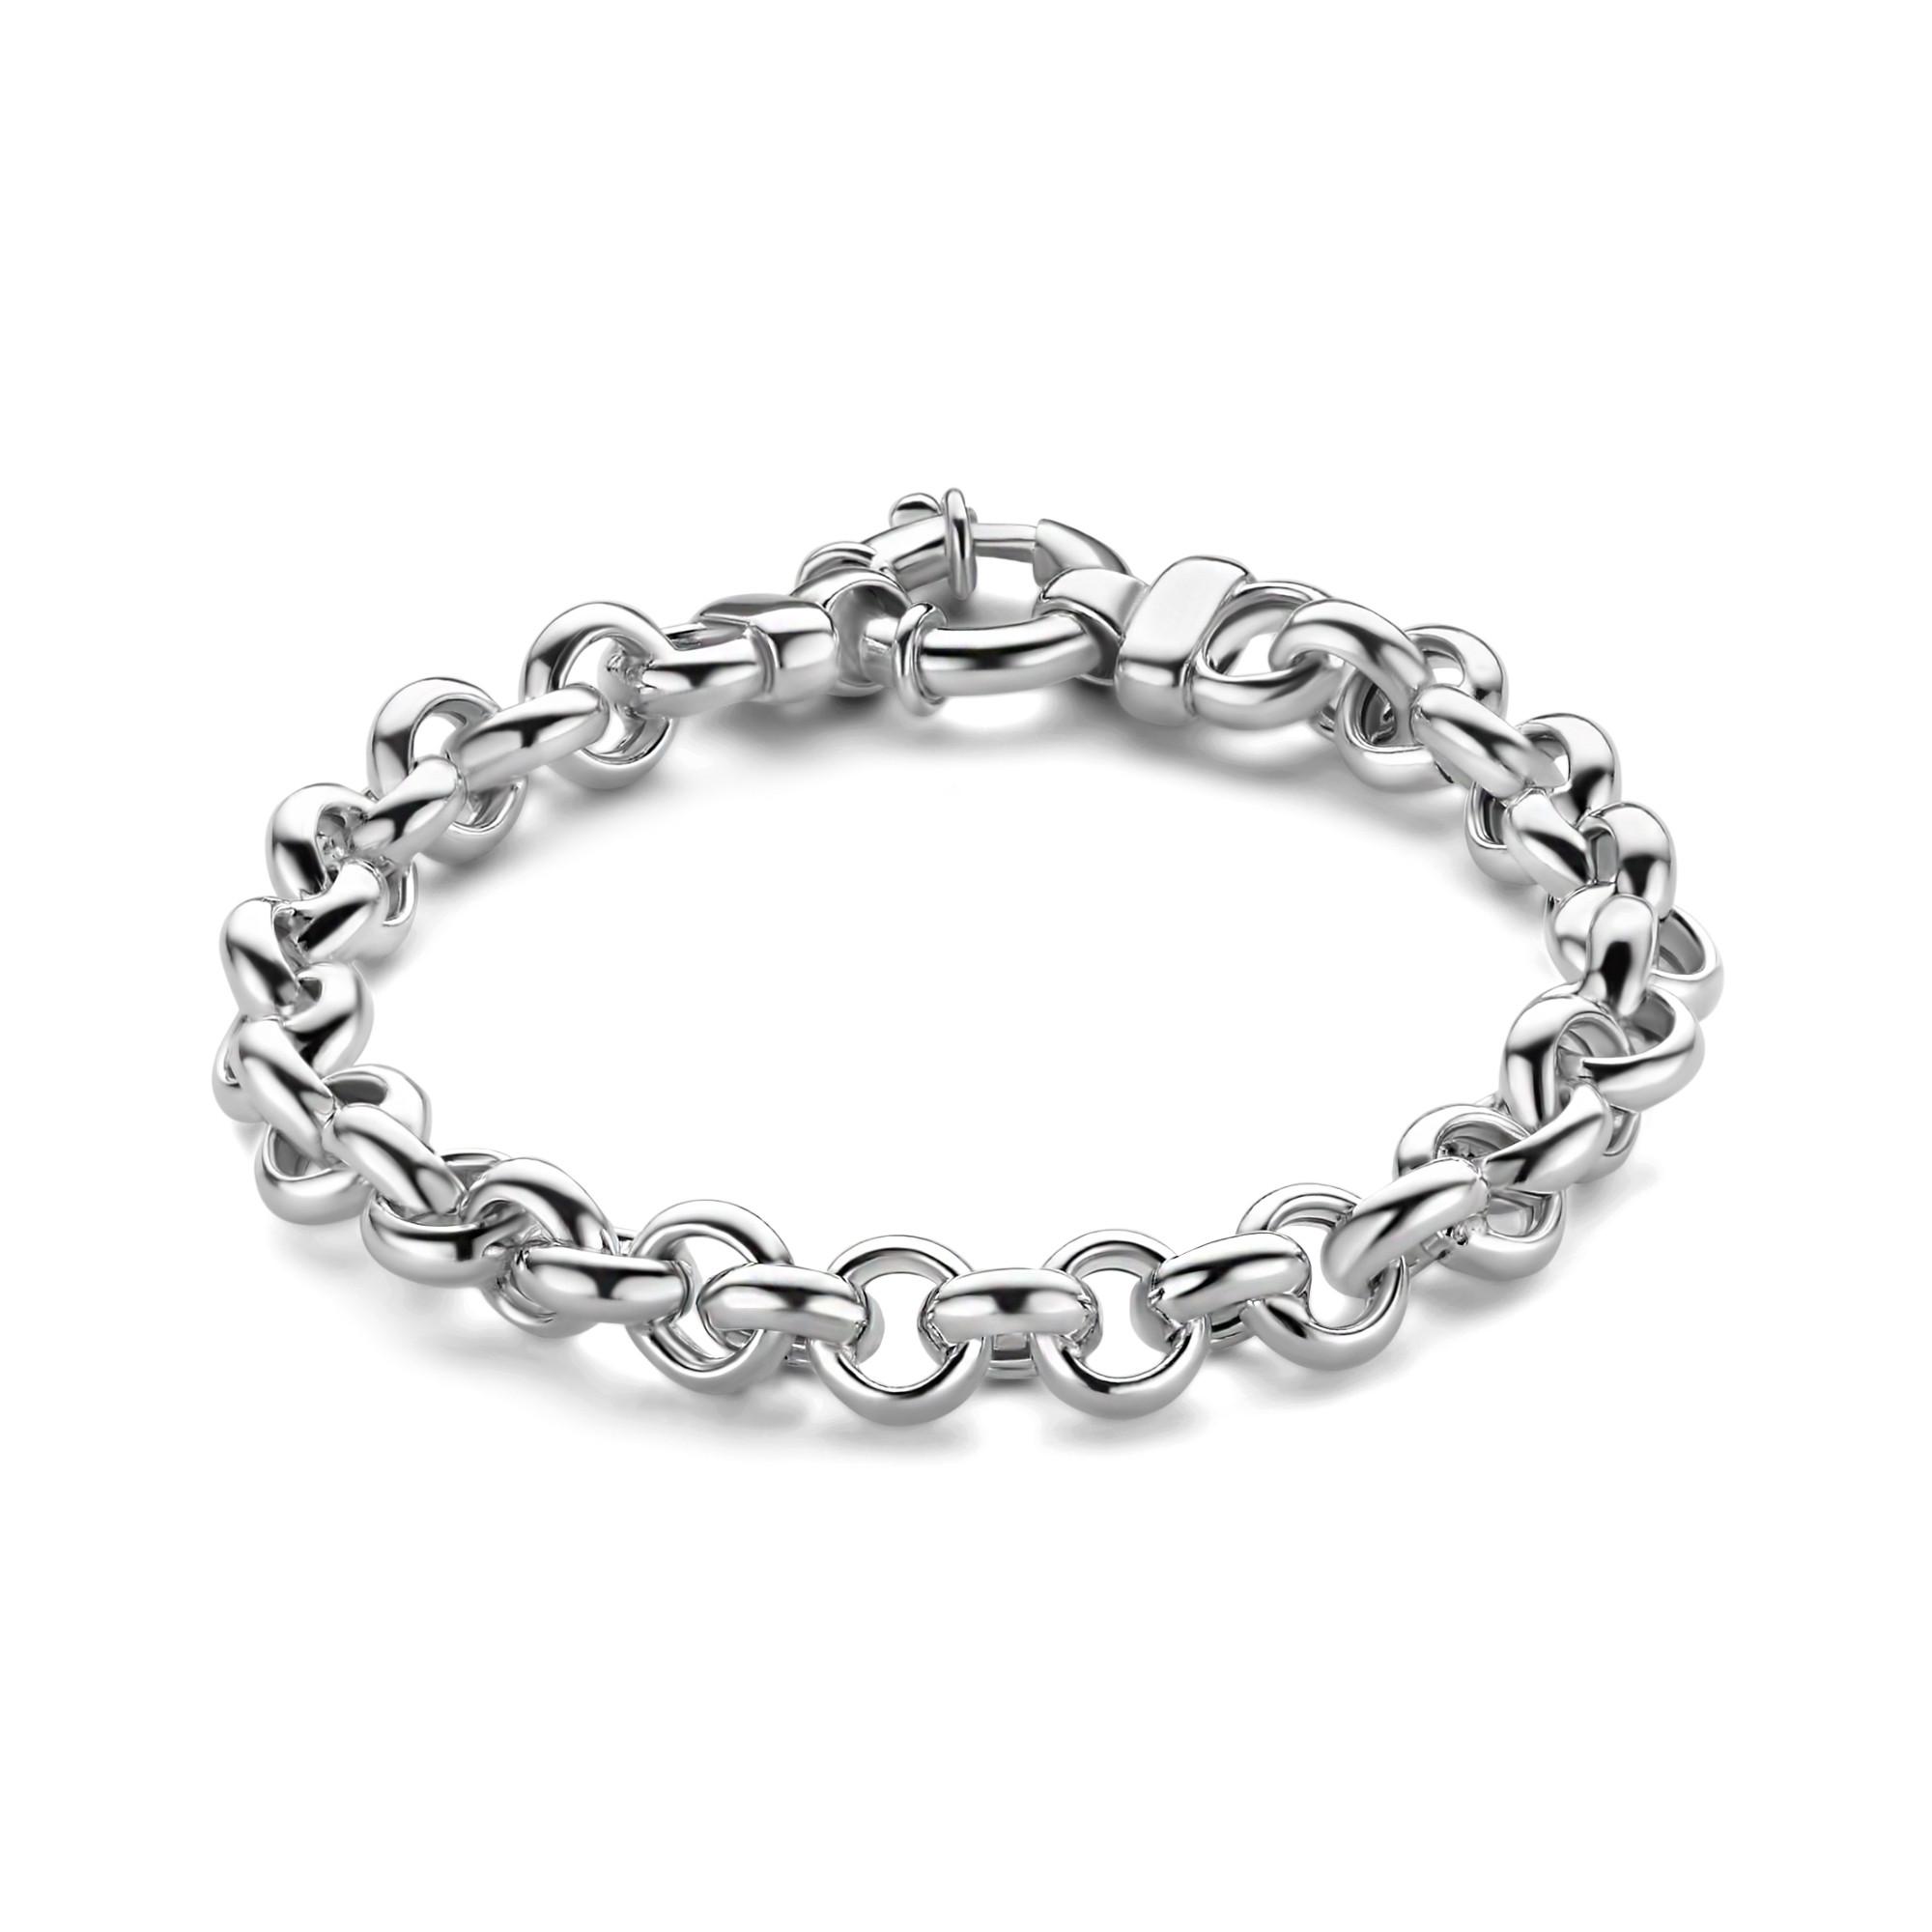 Zilveren jasseron armband 1040886-19